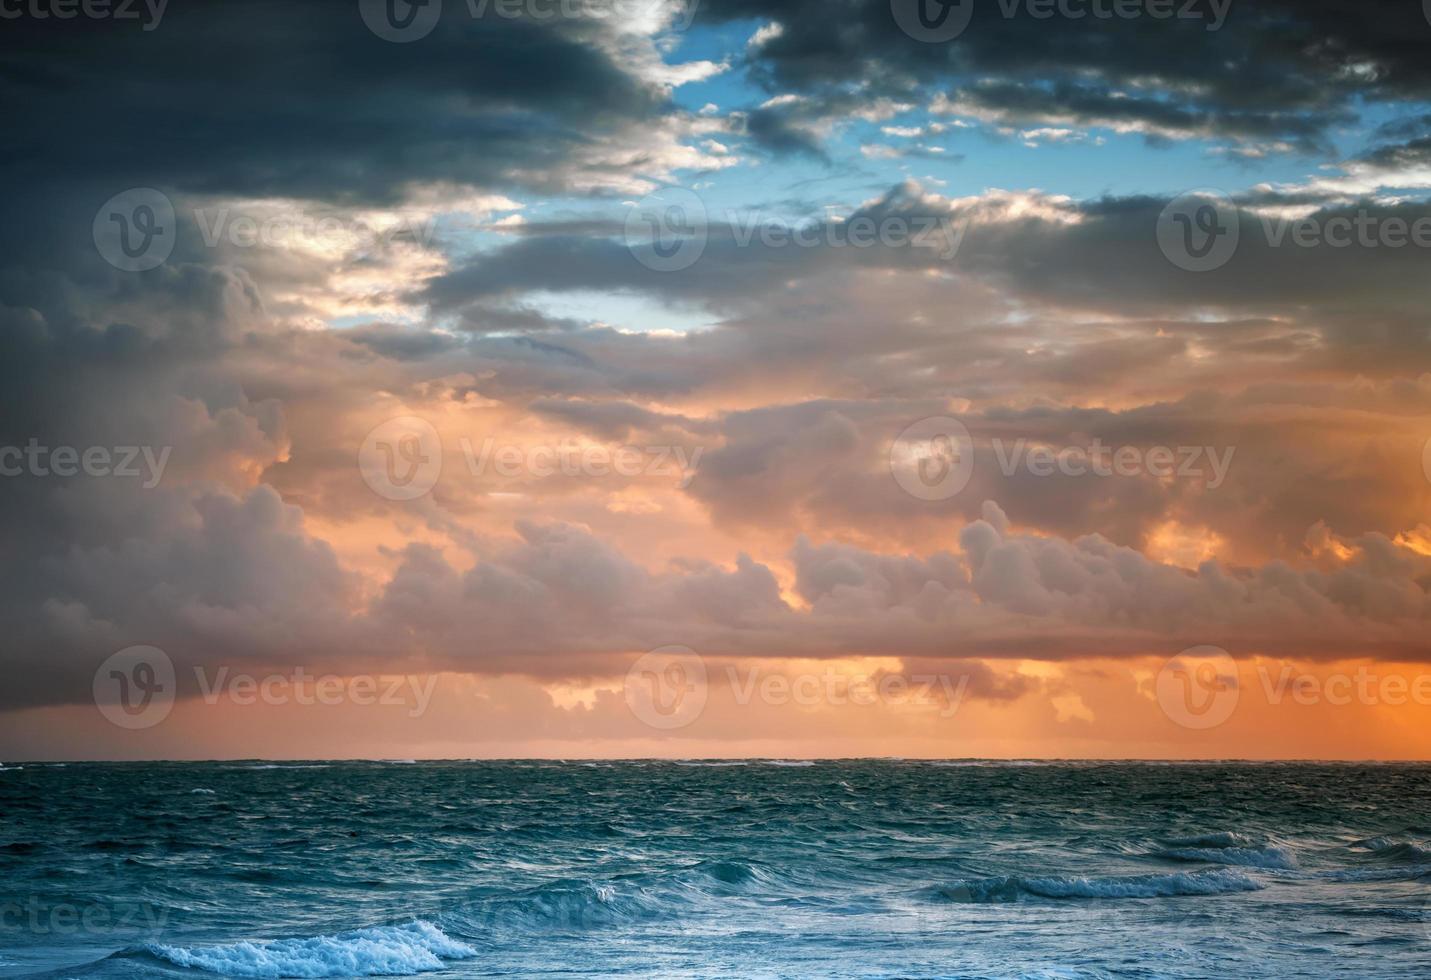 céu escuro e colorido do nascer do sol sobre o oceano atlântico foto